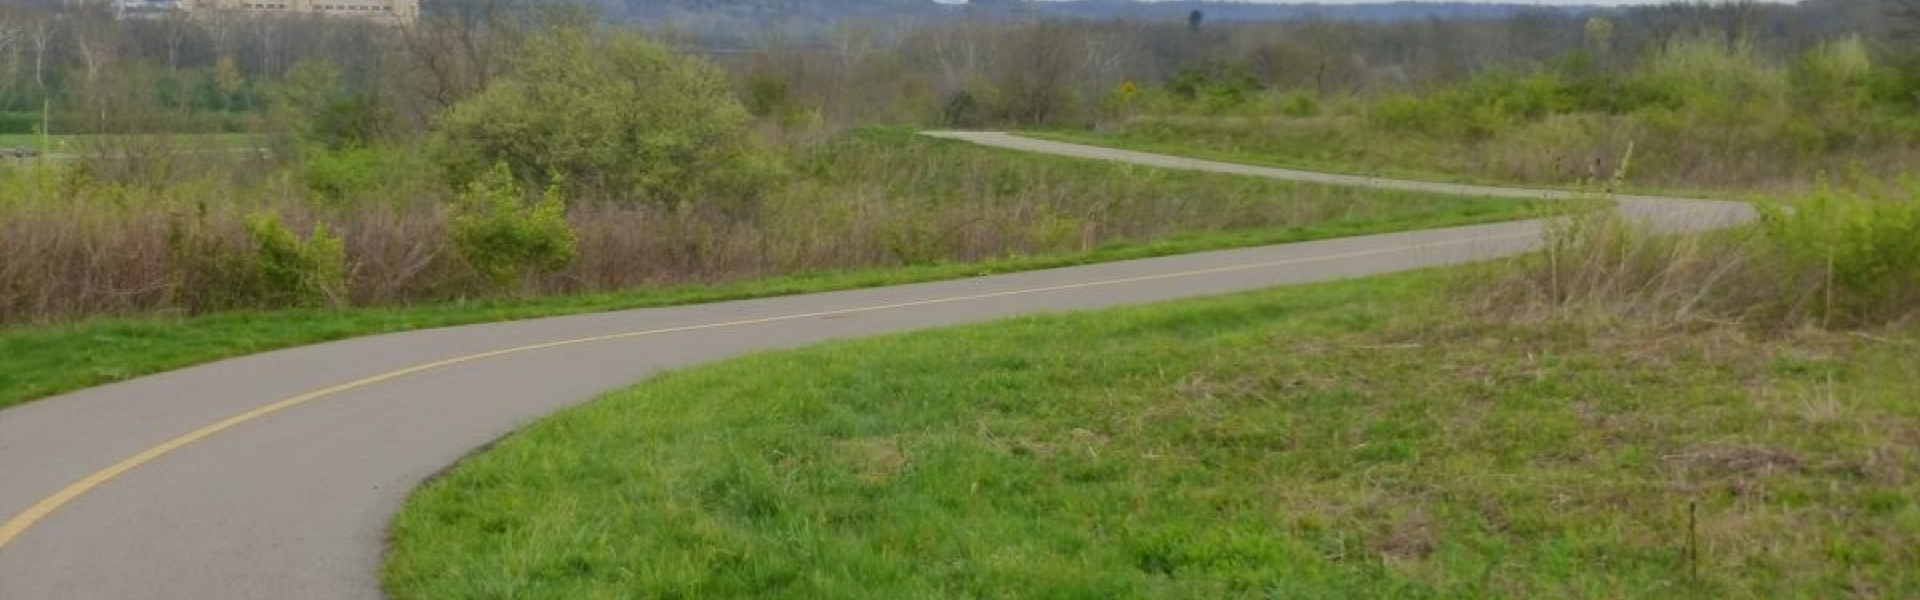 great-little trail | miami valley bike trails